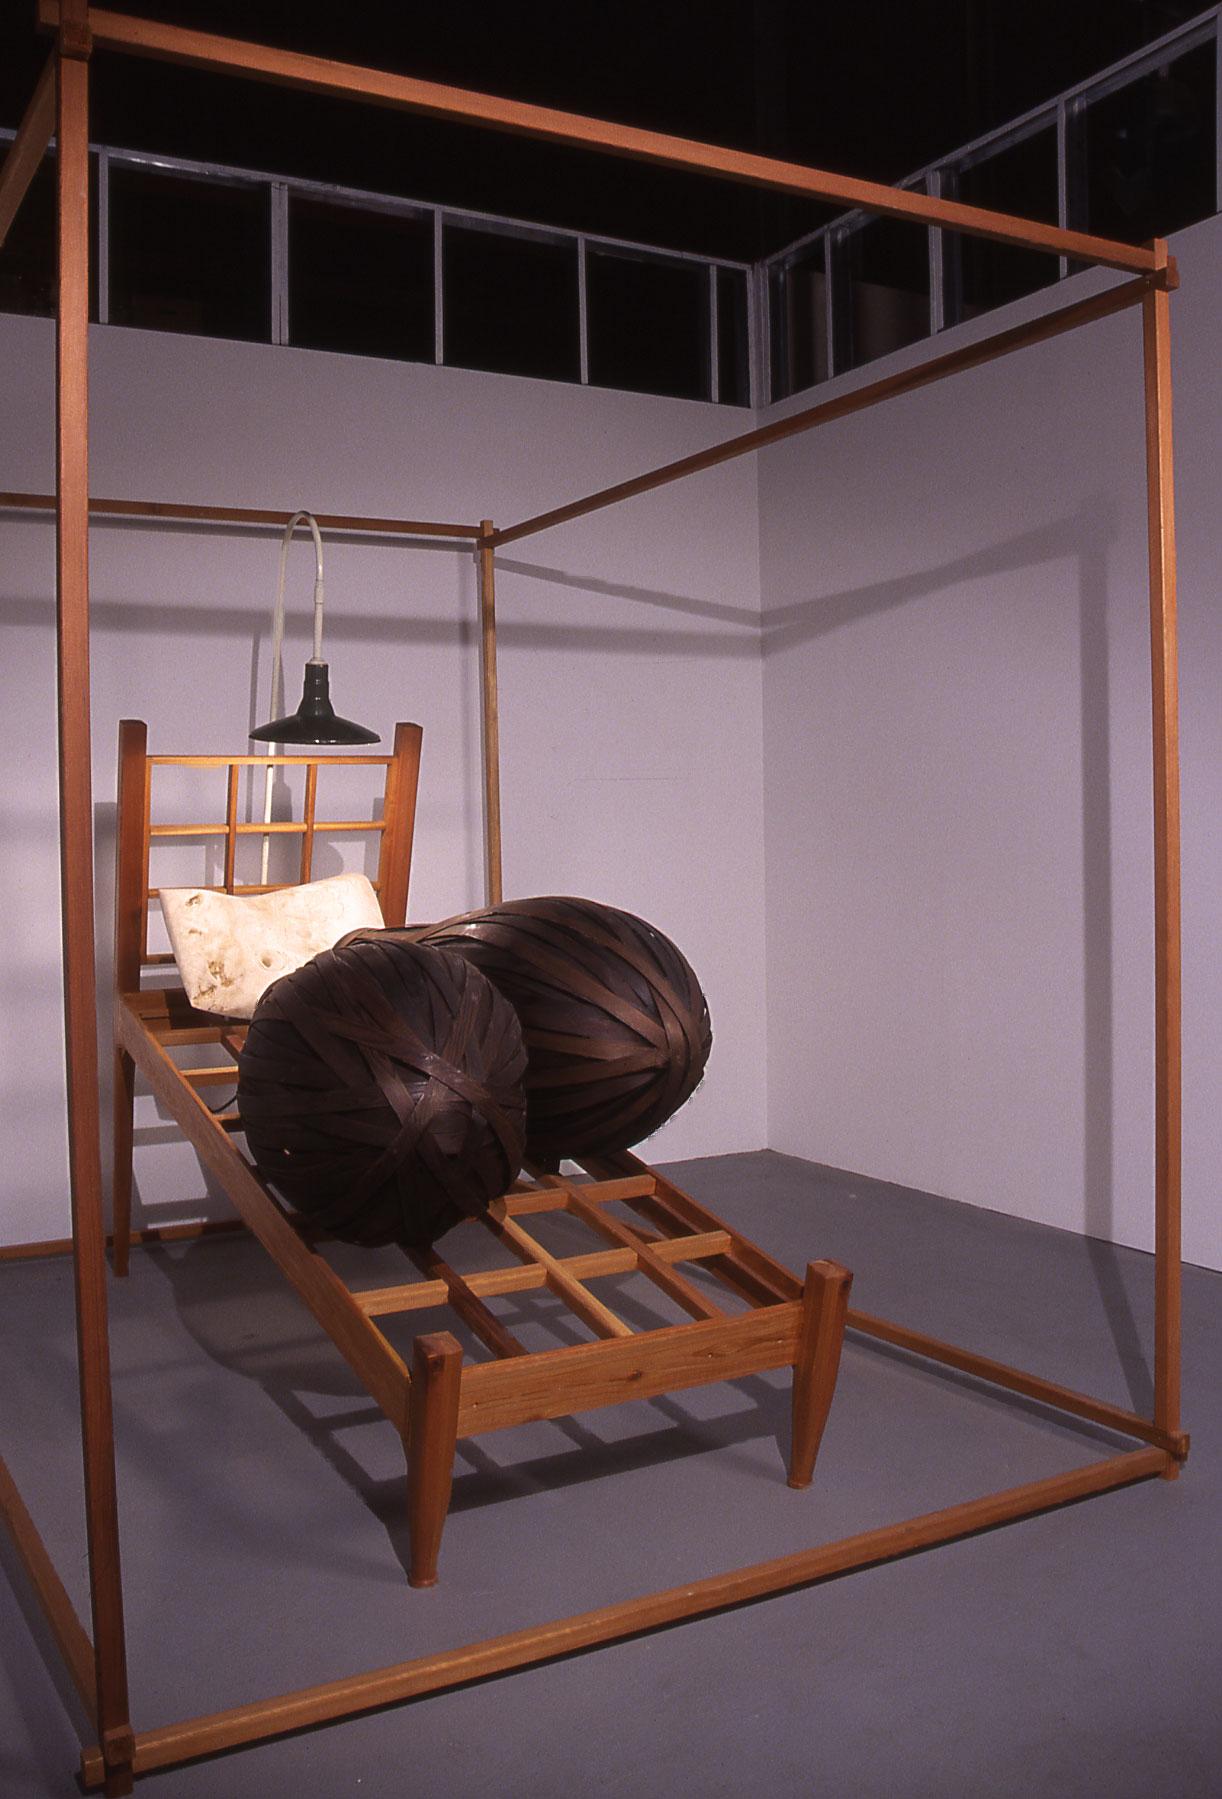 """Sleeping Double in a Single Bed"", wood sculpture 8' h x 7' w x 8' d ; ebonized Cedar, carved Poplar, electric light; © Tom Gormally"